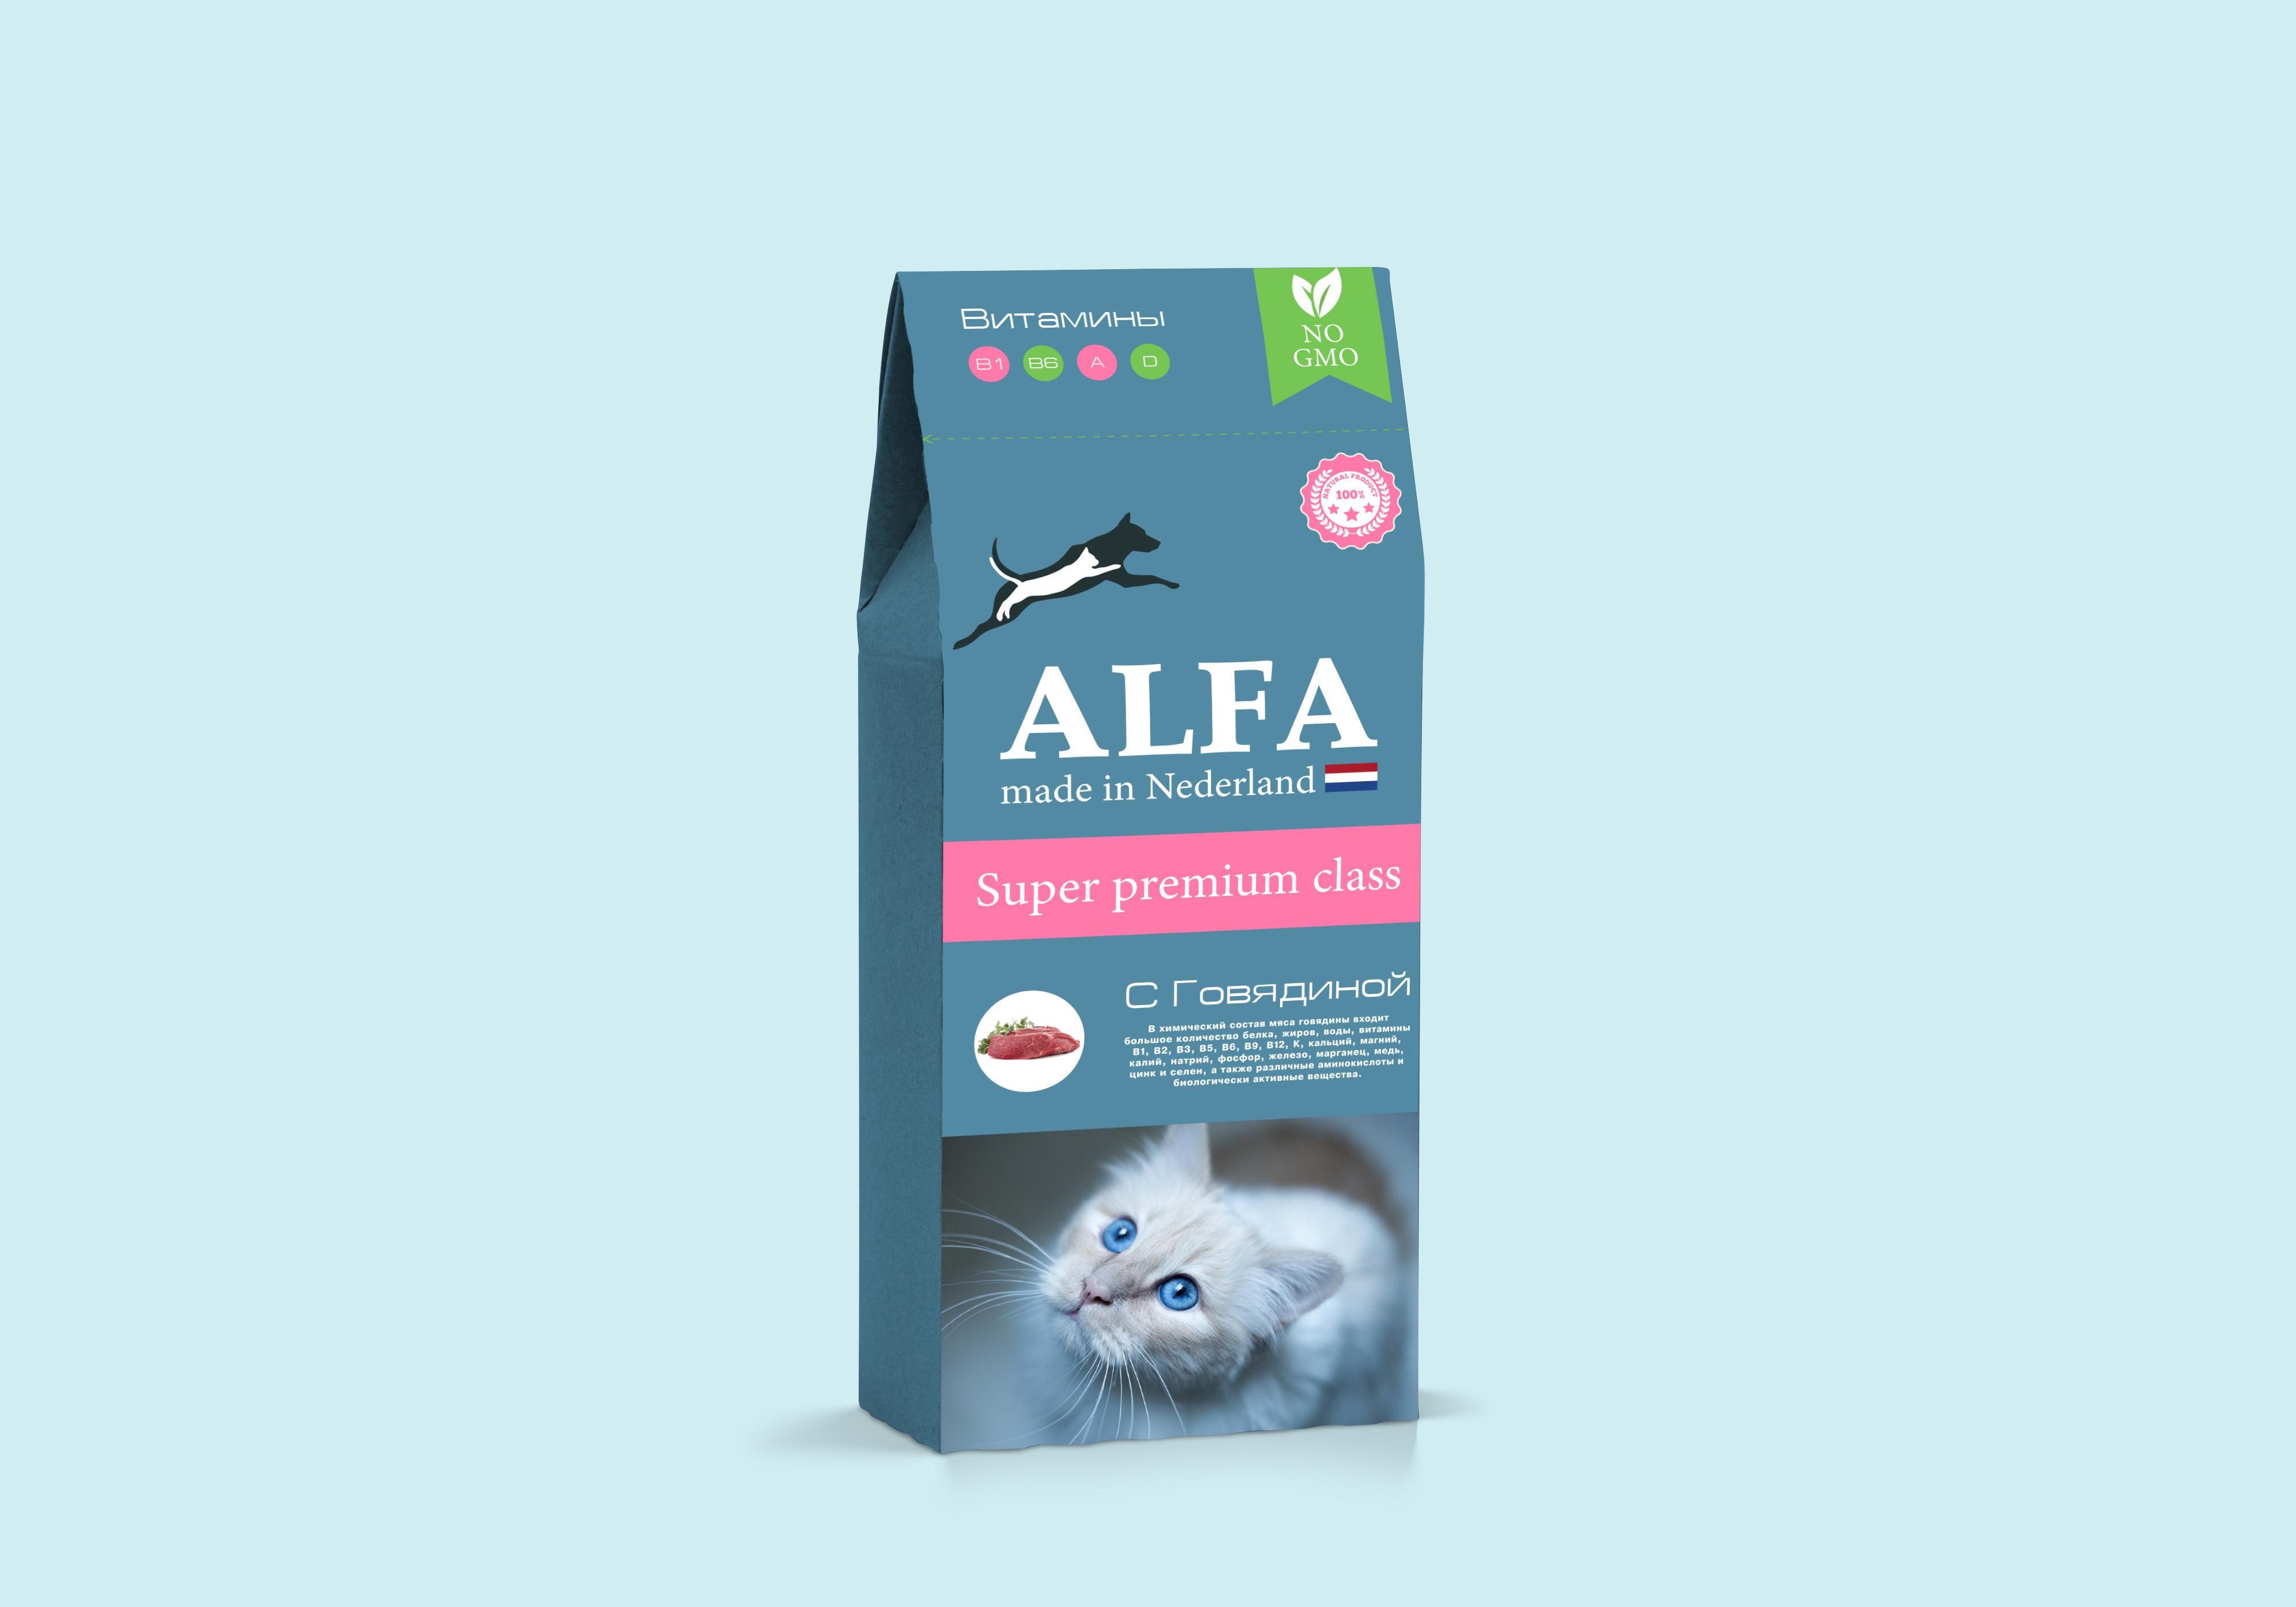 Создание дизайна упаковки для кормов для животных. фото f_2905ae220ae88b12.jpg